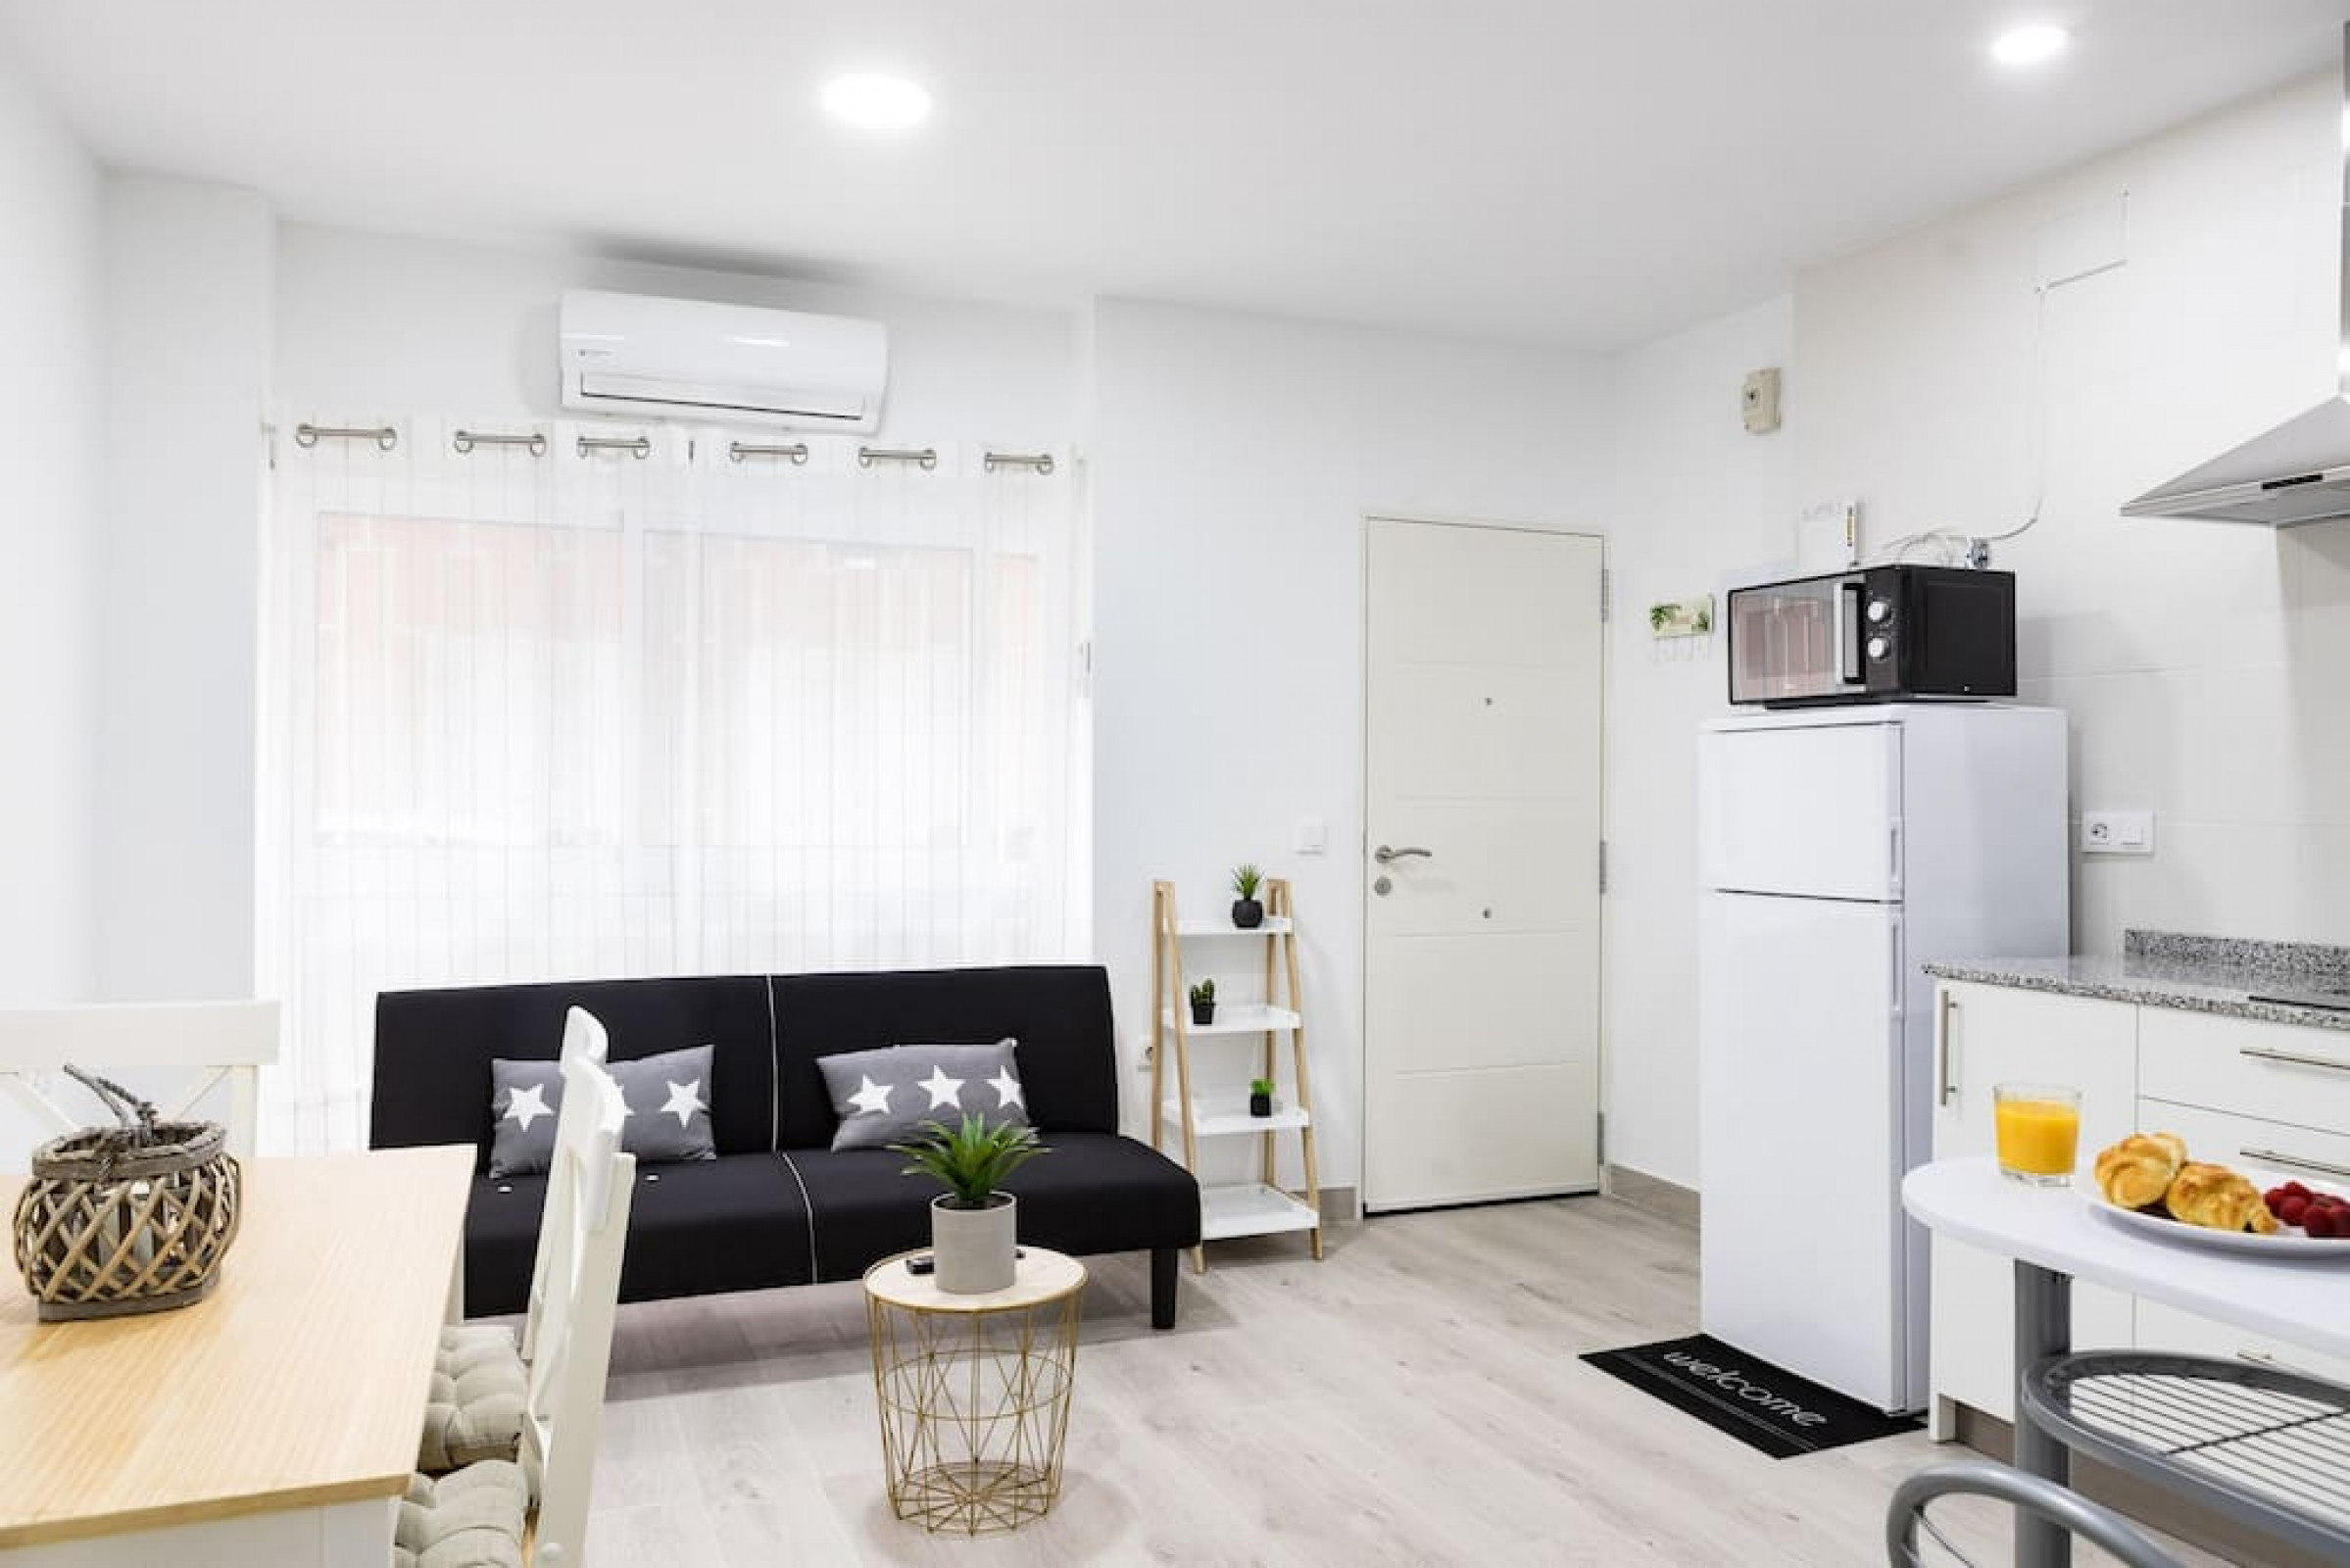 Moonkey - Apartamento Amaralba A